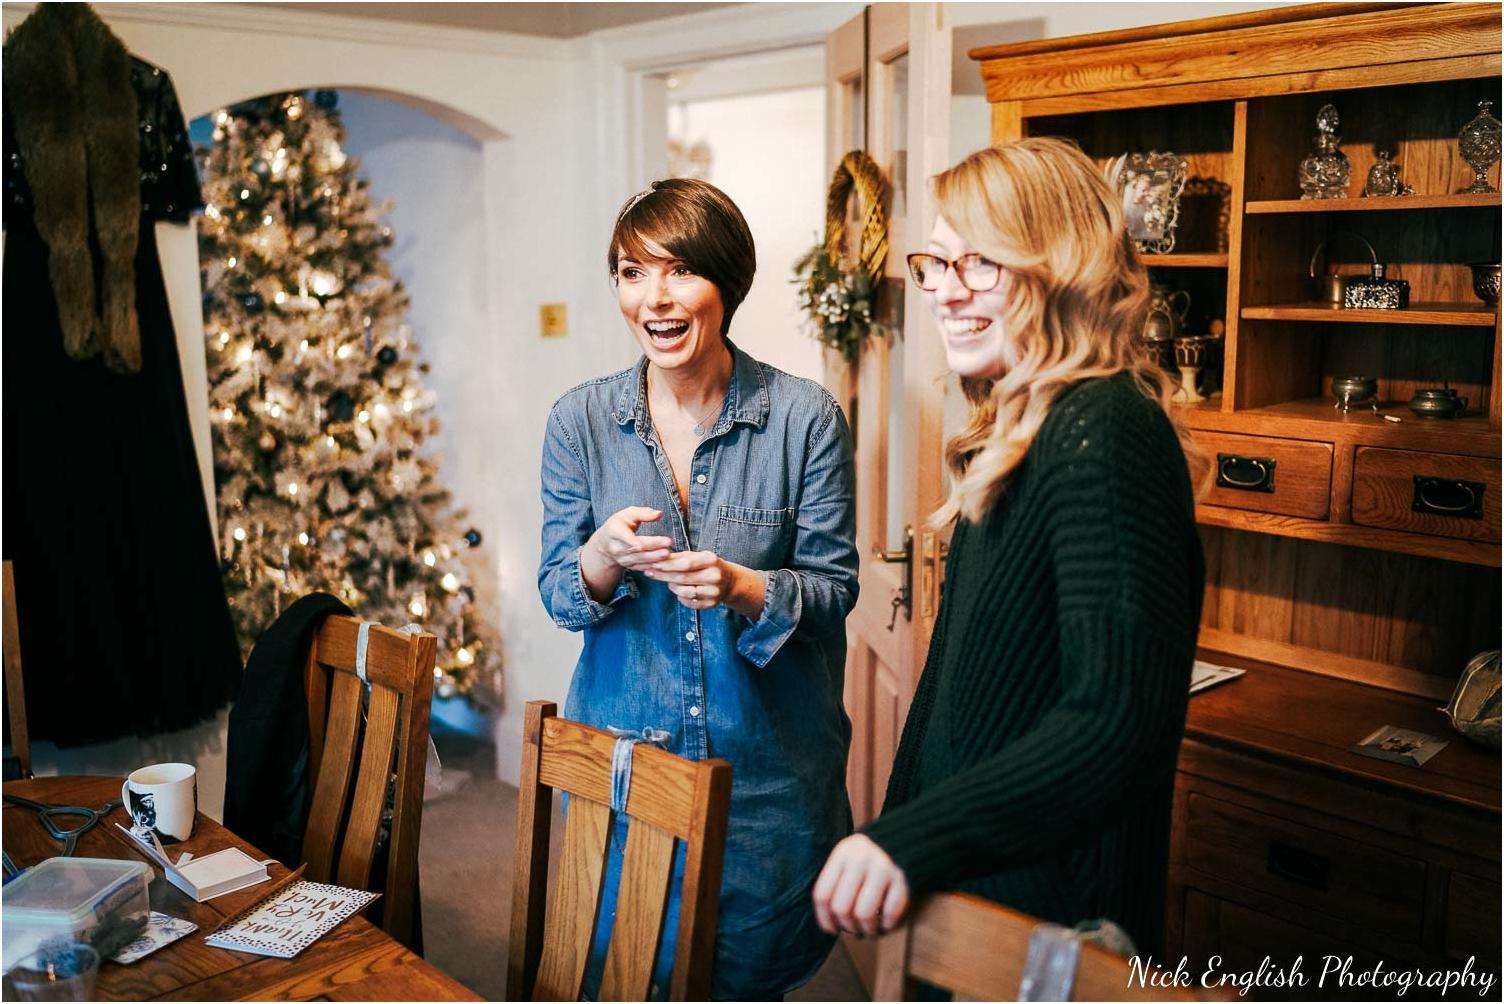 Mitton_Hall_Christmas_Winter_Wedding-8.jpg